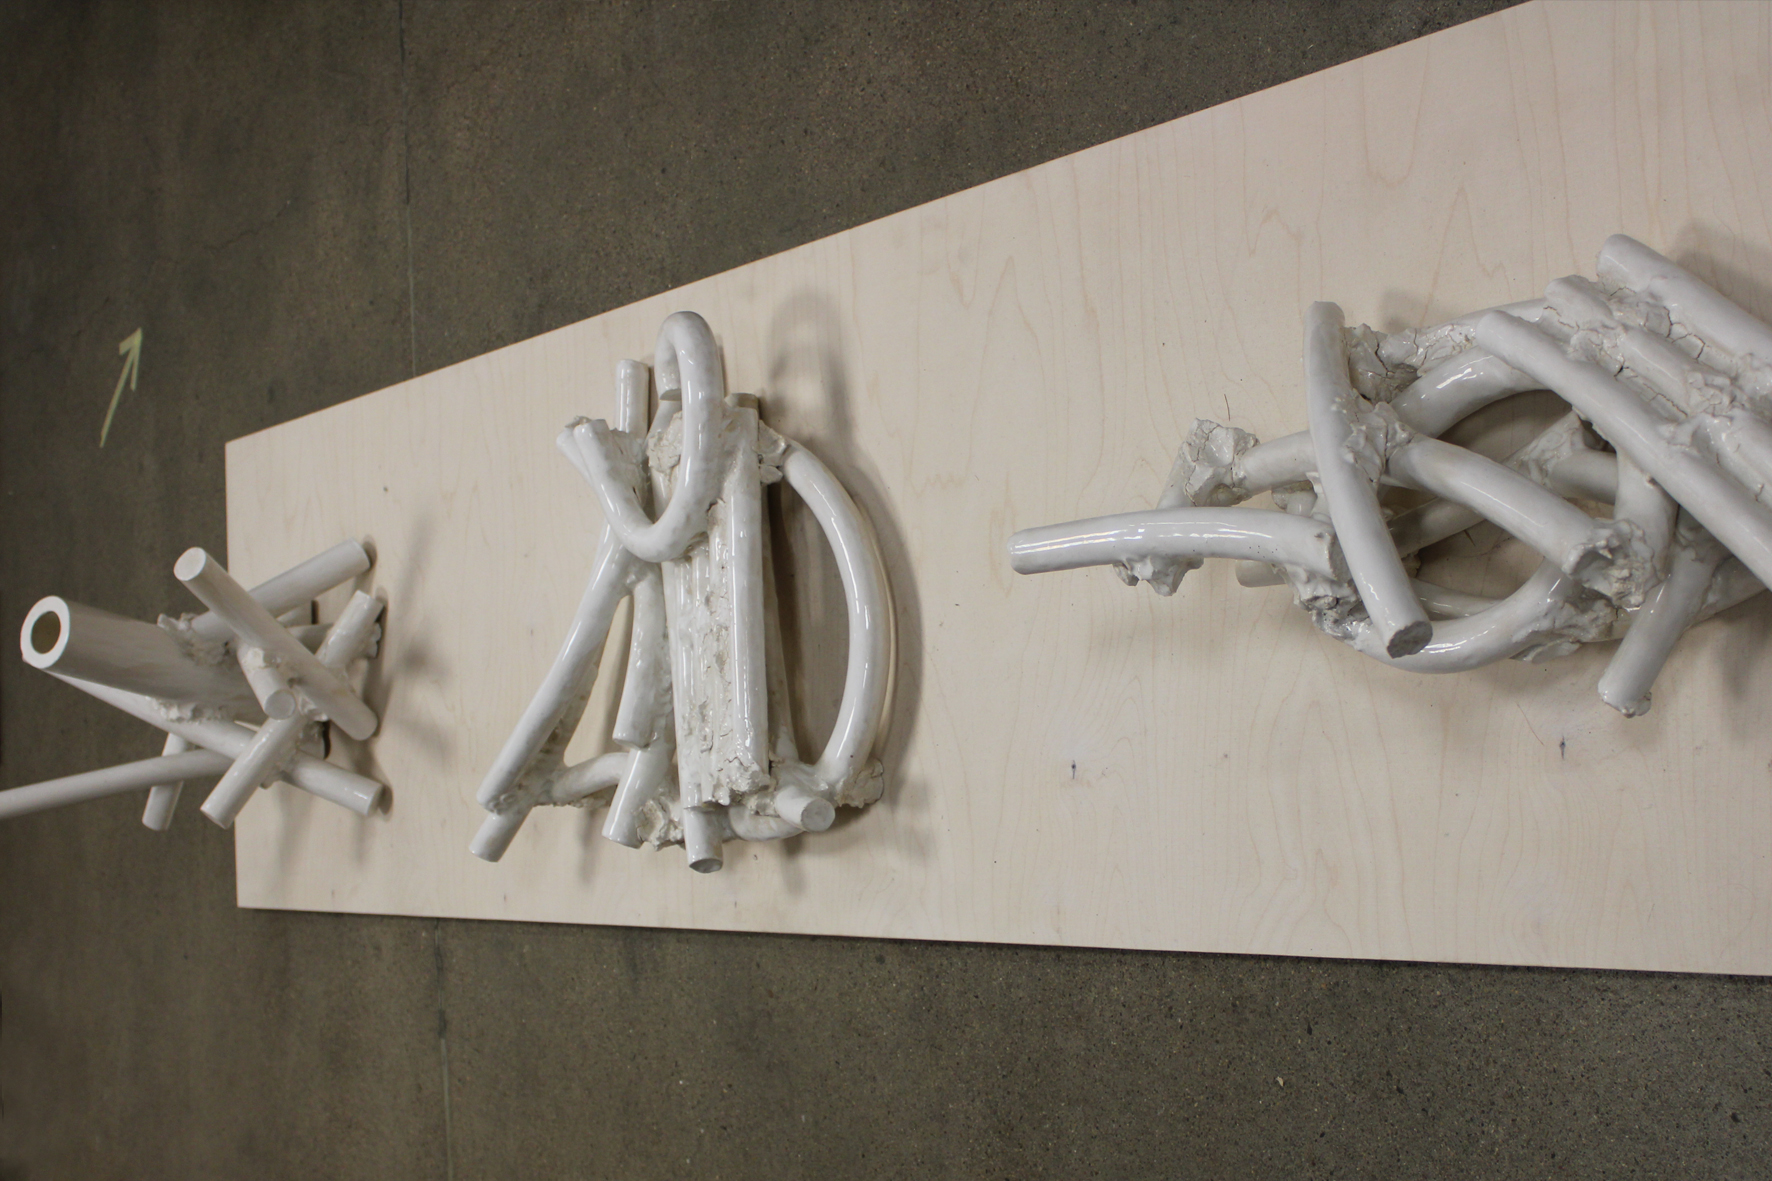 4.10.20, Keramik - Schmuck, Hildesheim